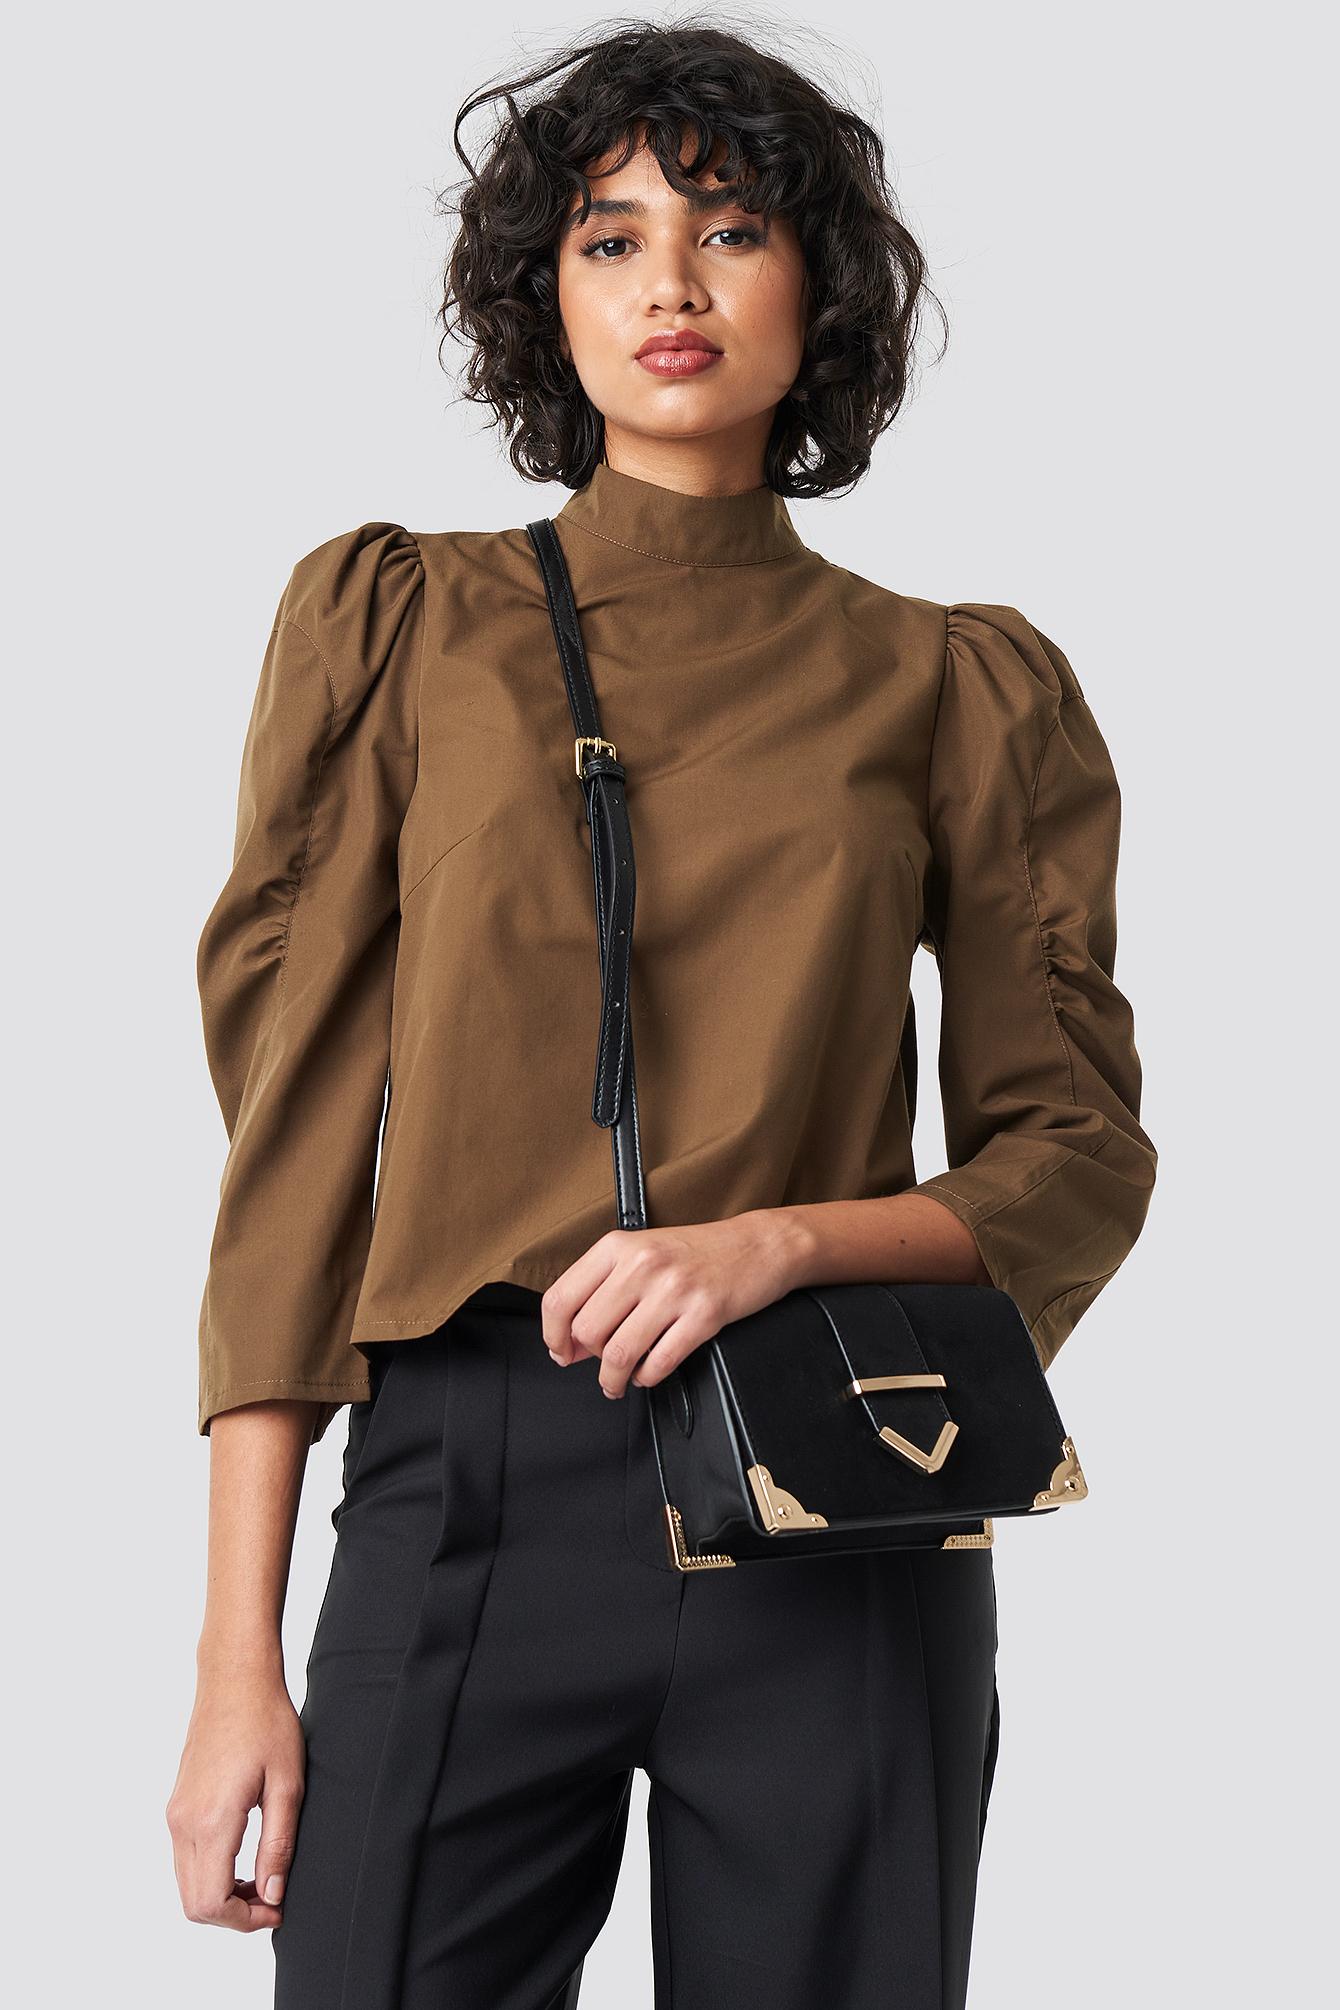 Kimono Collar Coat Black | na-kd.com